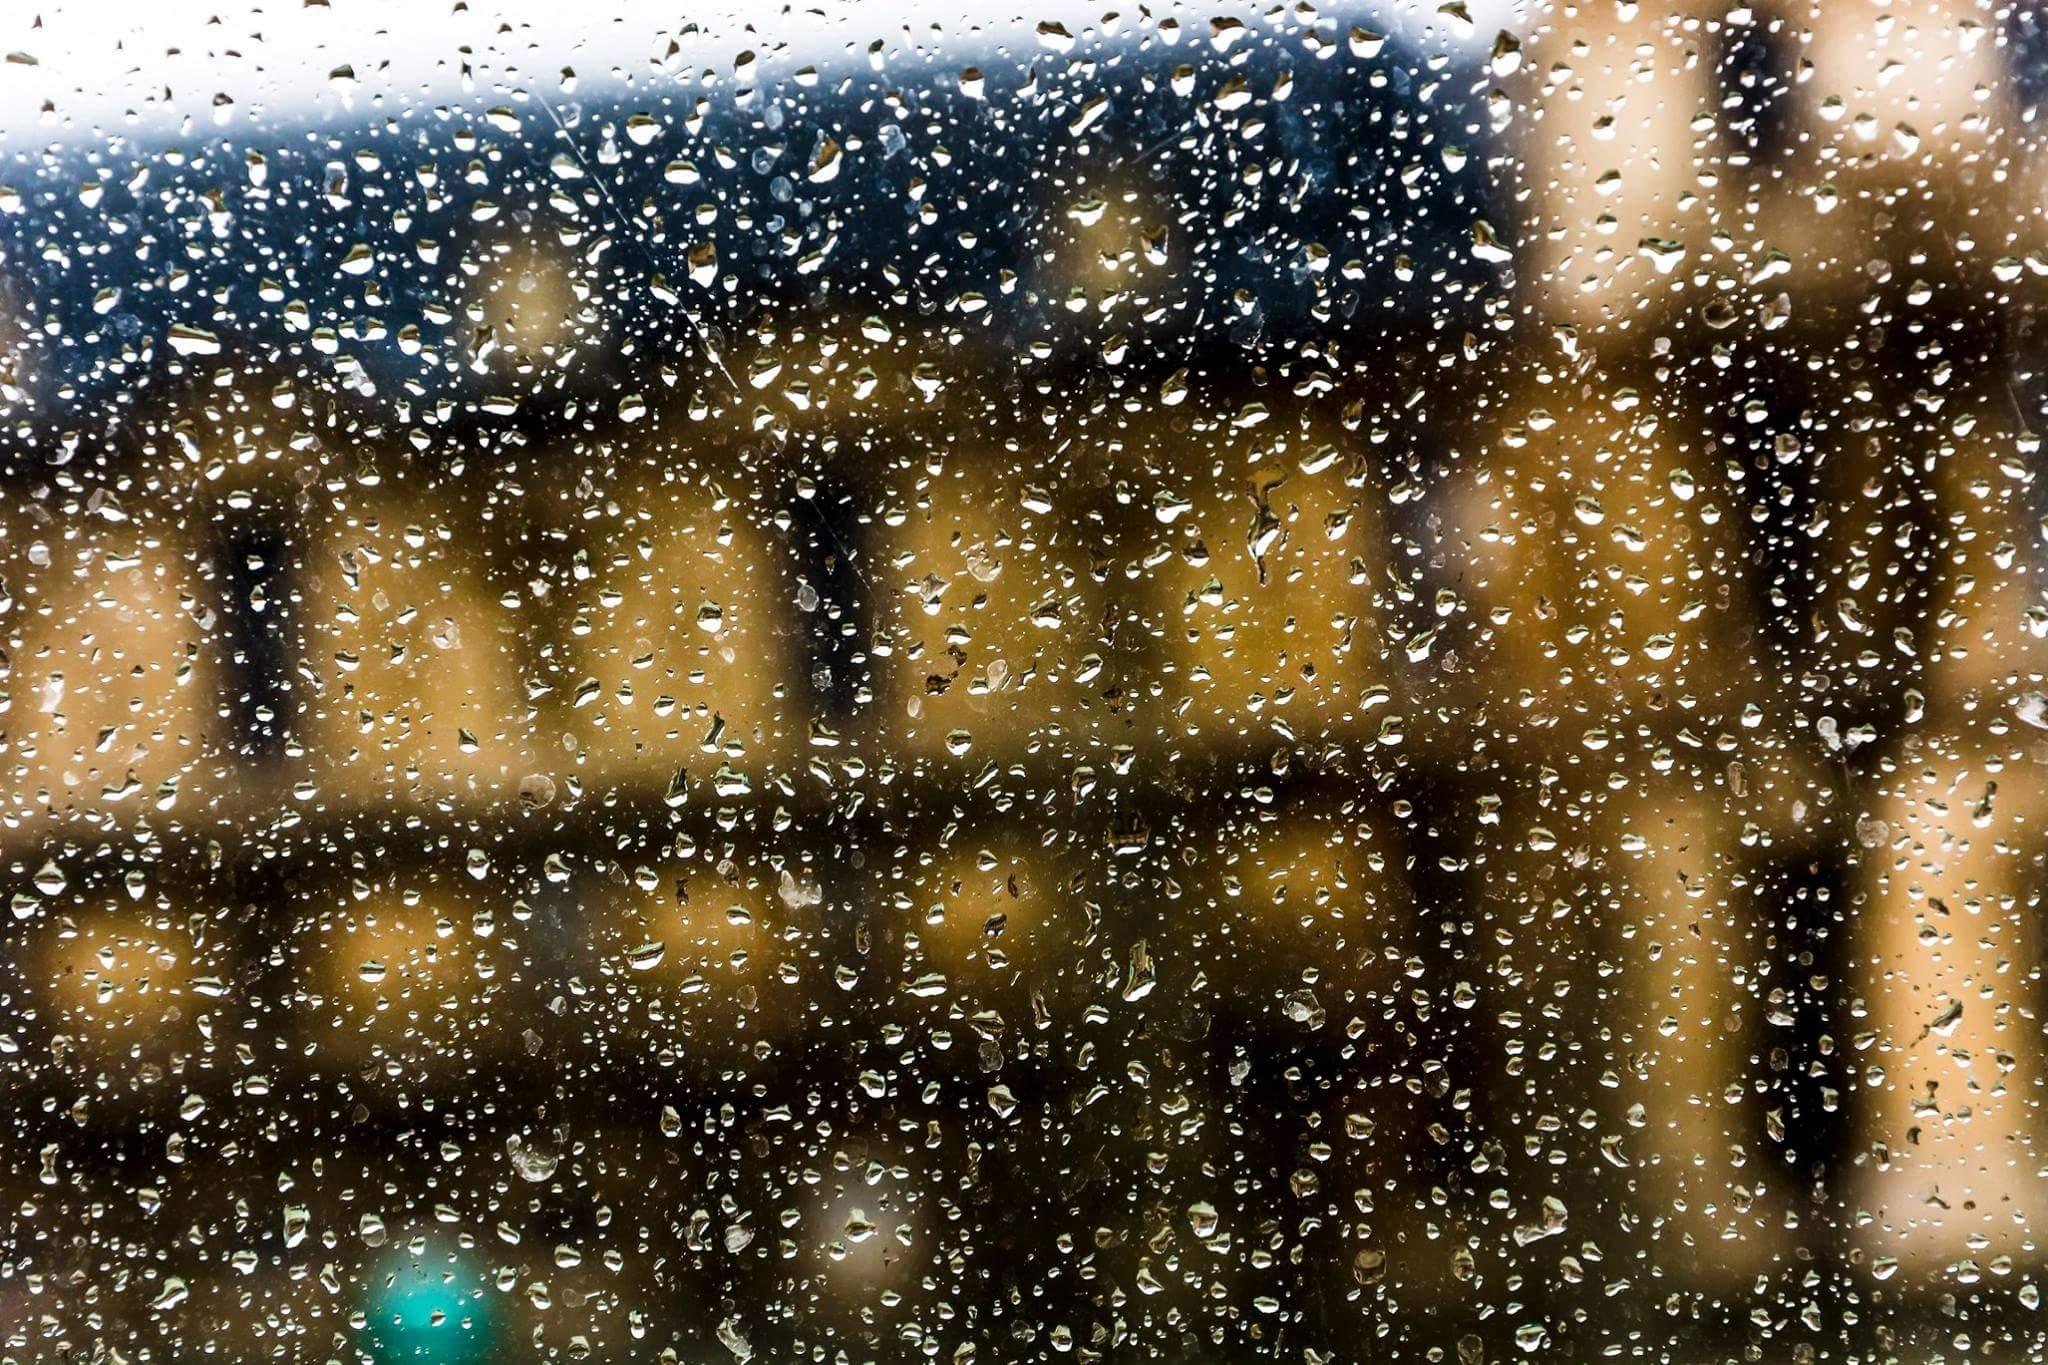 raindrops by Giorgos Rentzios